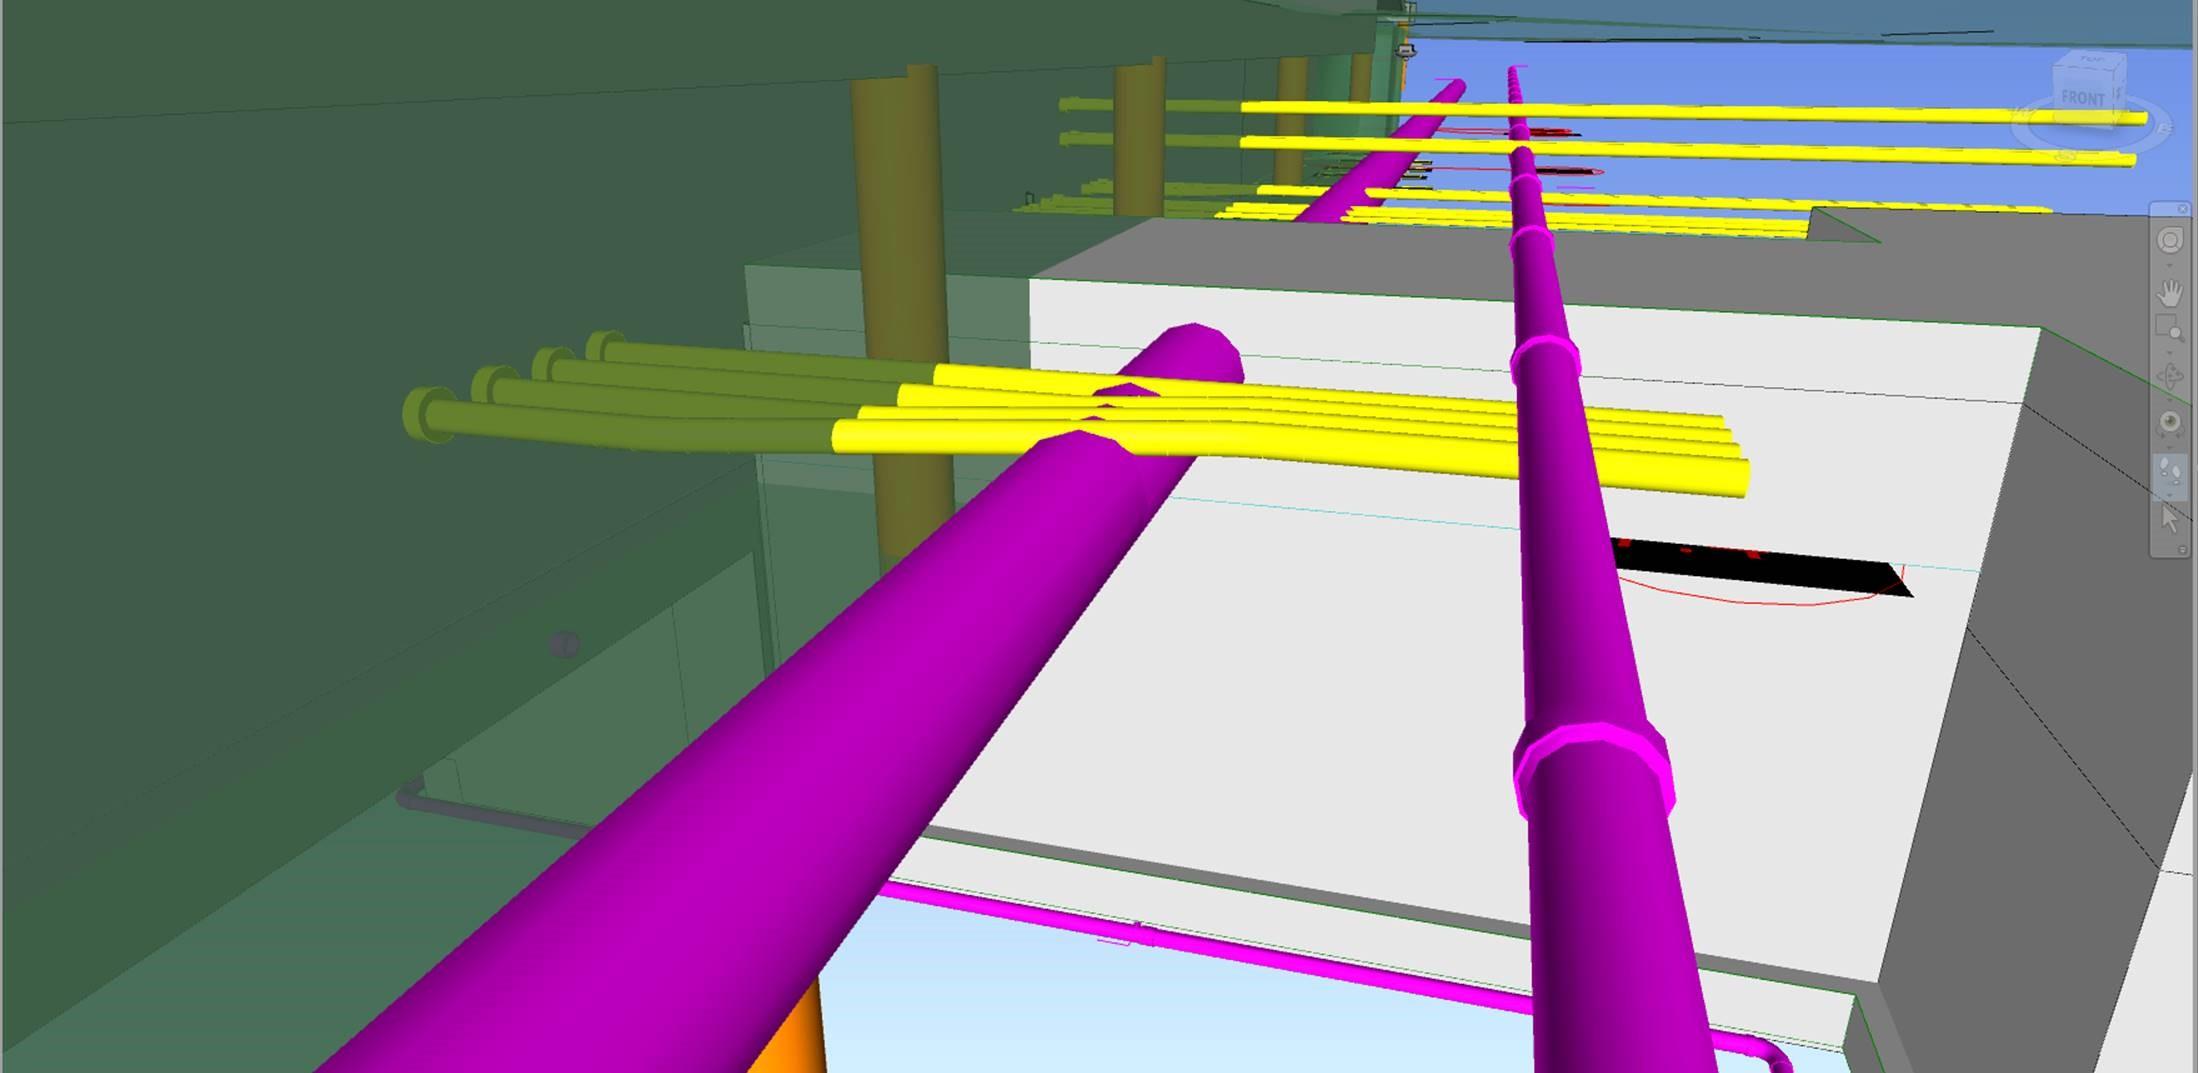 plumbing-conduit clash2